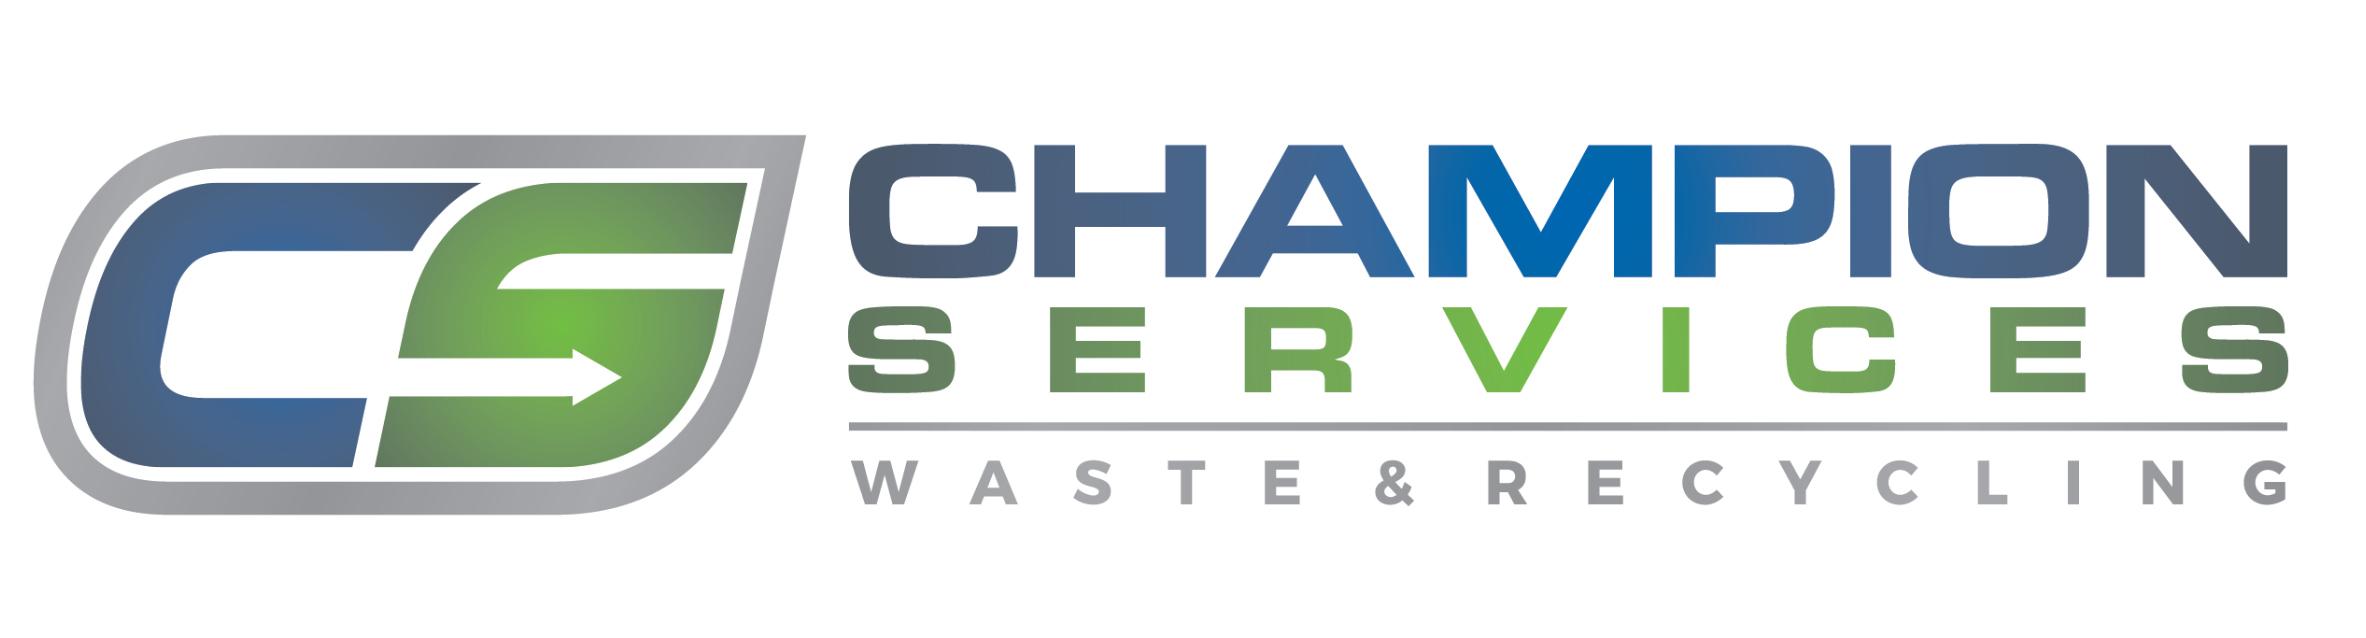 Champion Services Inc. | CSWaste